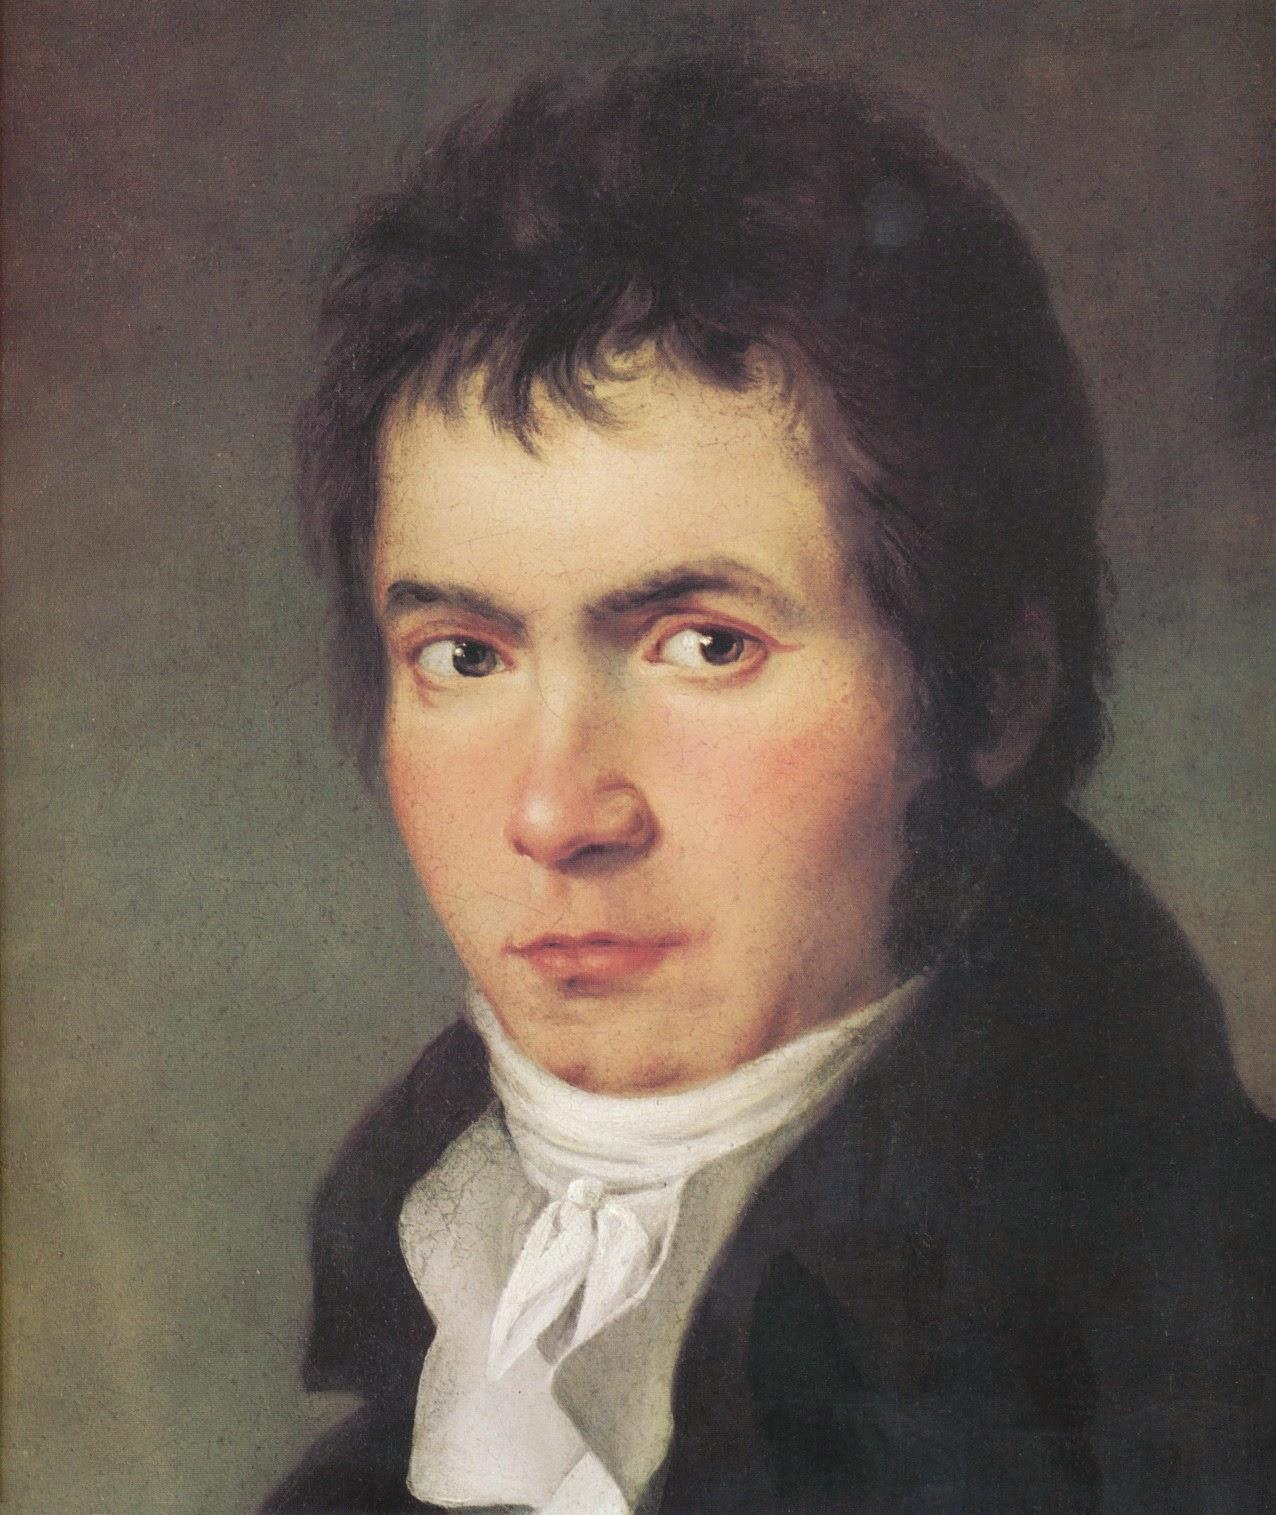 Retrato de Beethoven (pintura de W.J. Mähler)